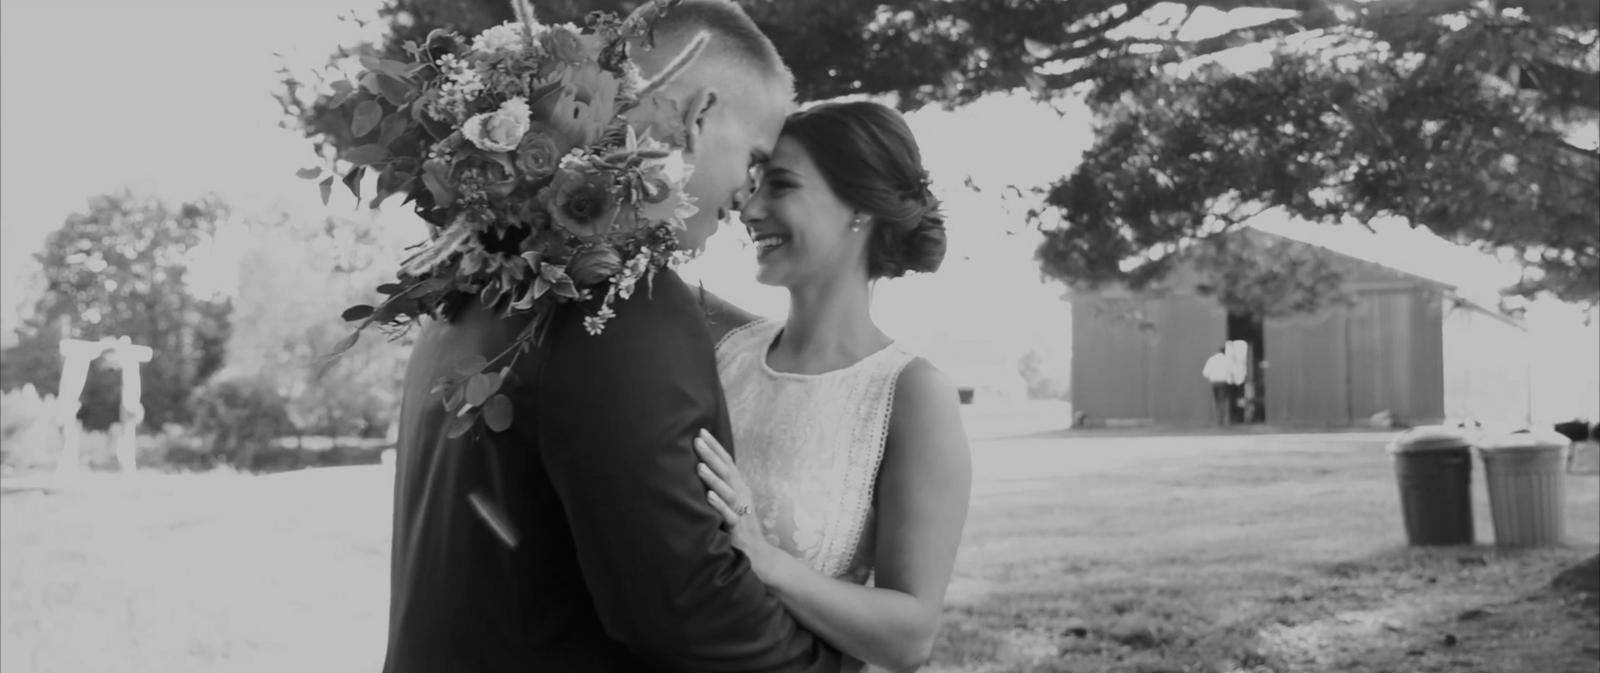 Joshua + Kynslie Backyard Wedding Anniversary